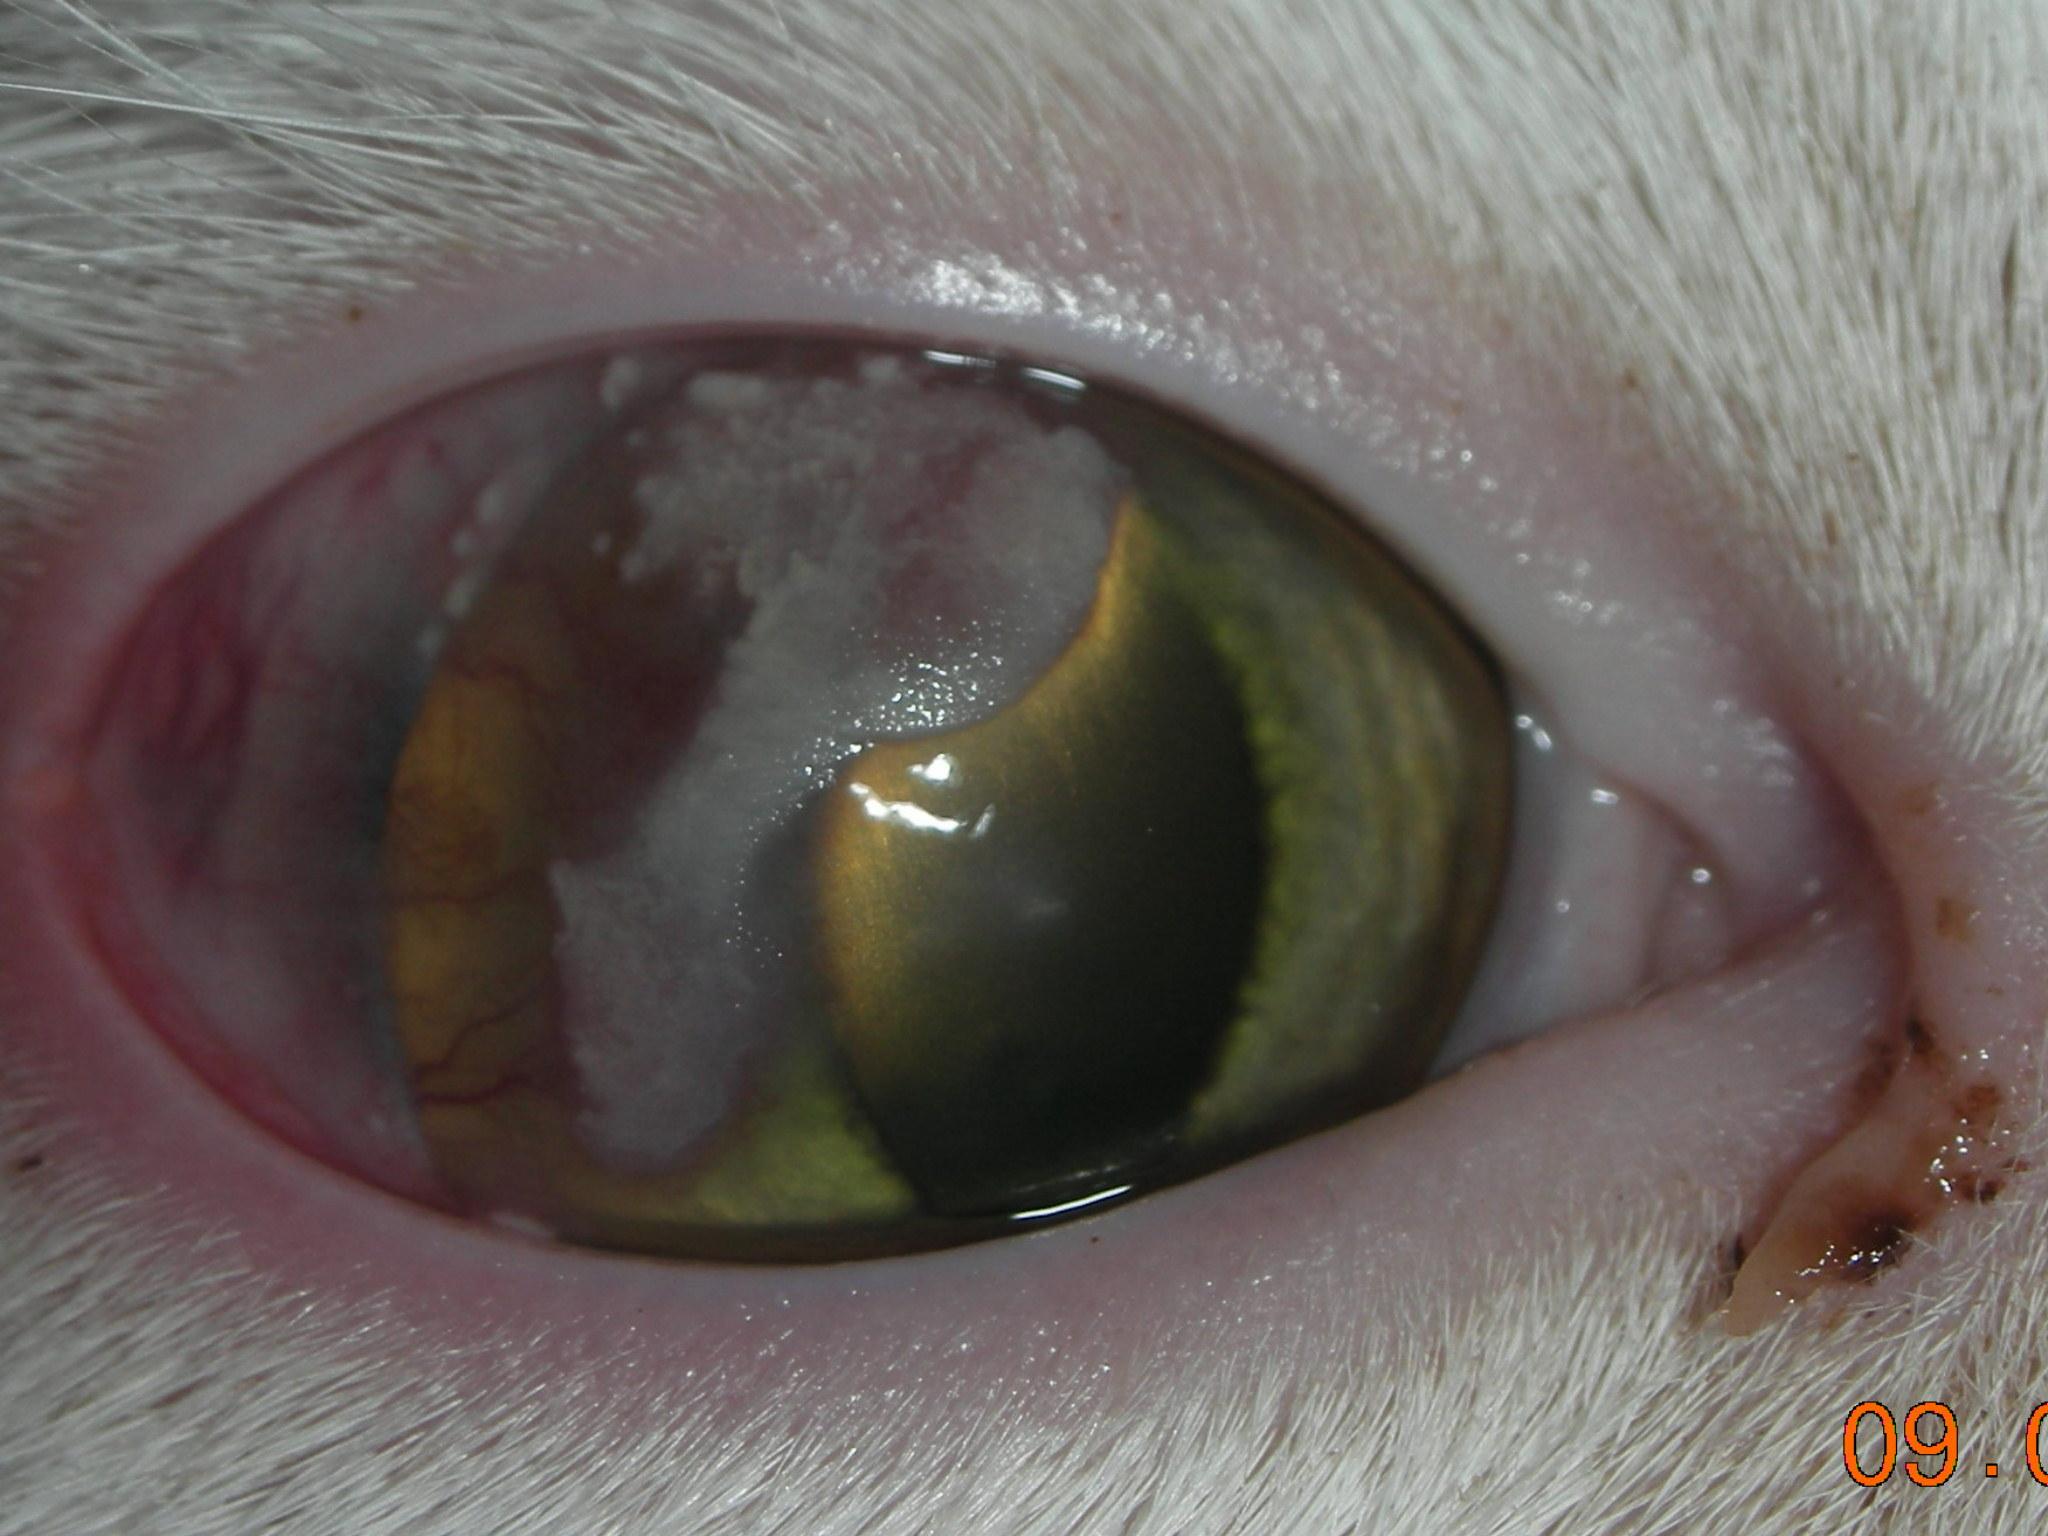 Eosinophilic Keratitis